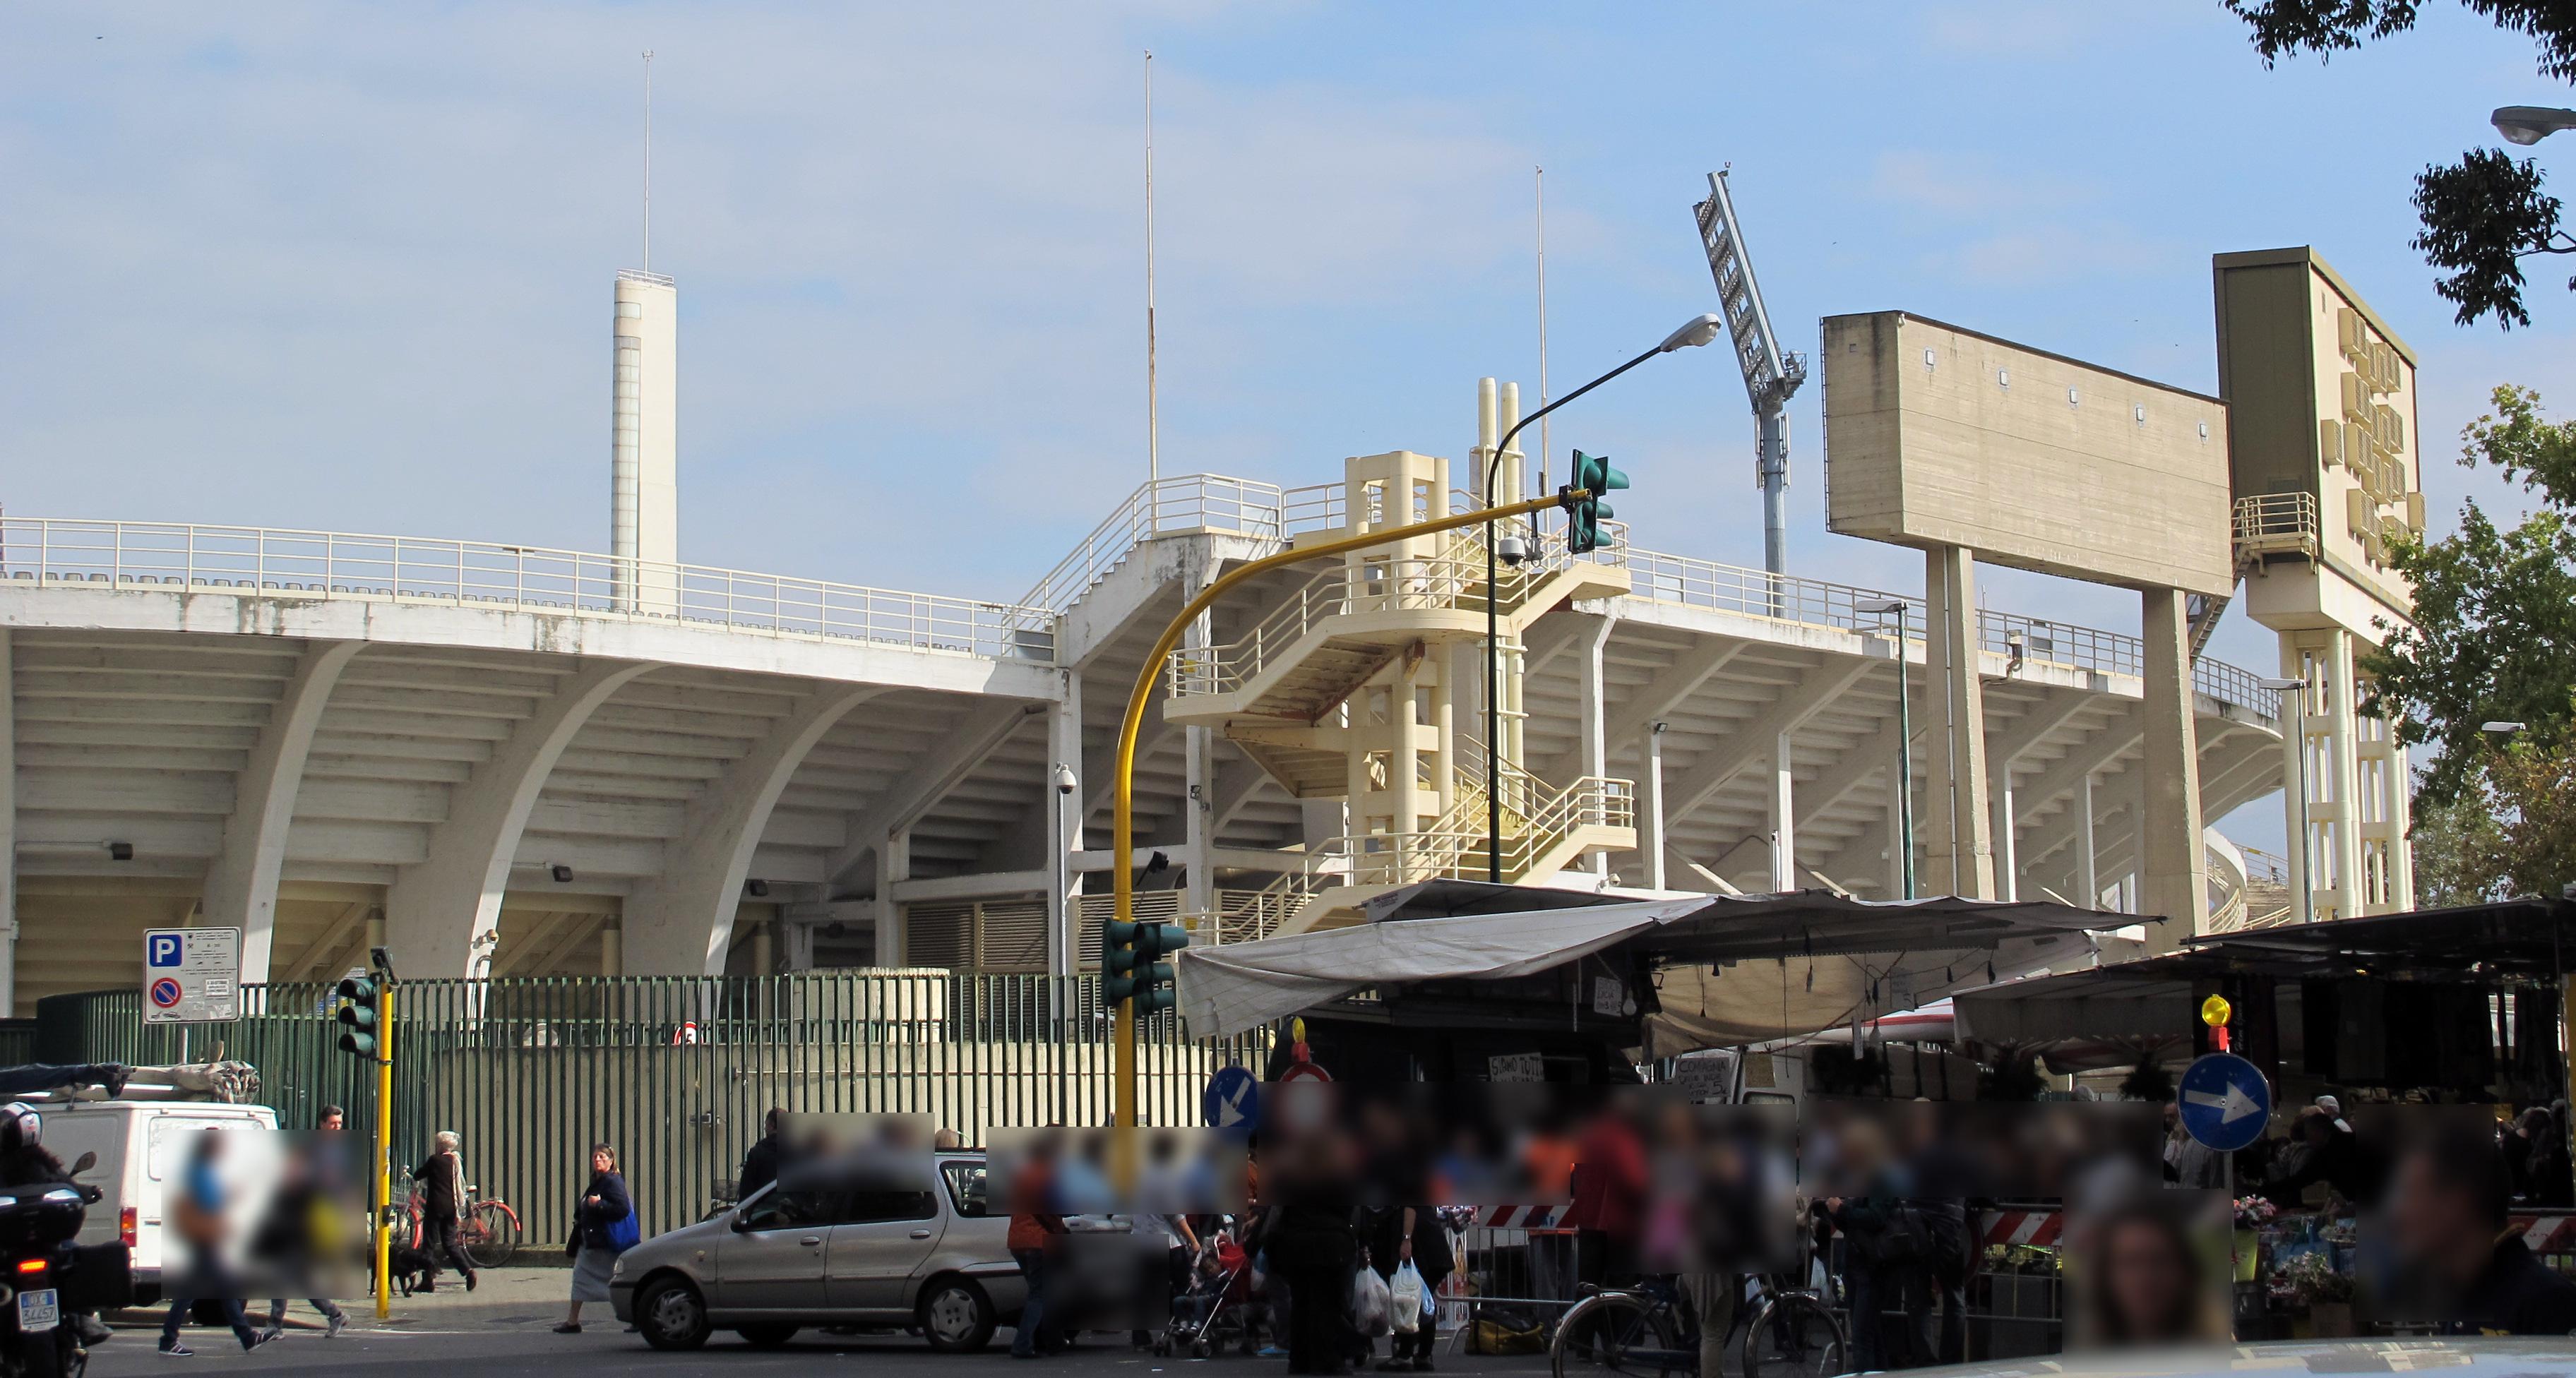 File:Stadio artemio franchi, firenze.JPG - Wikimedia Commons